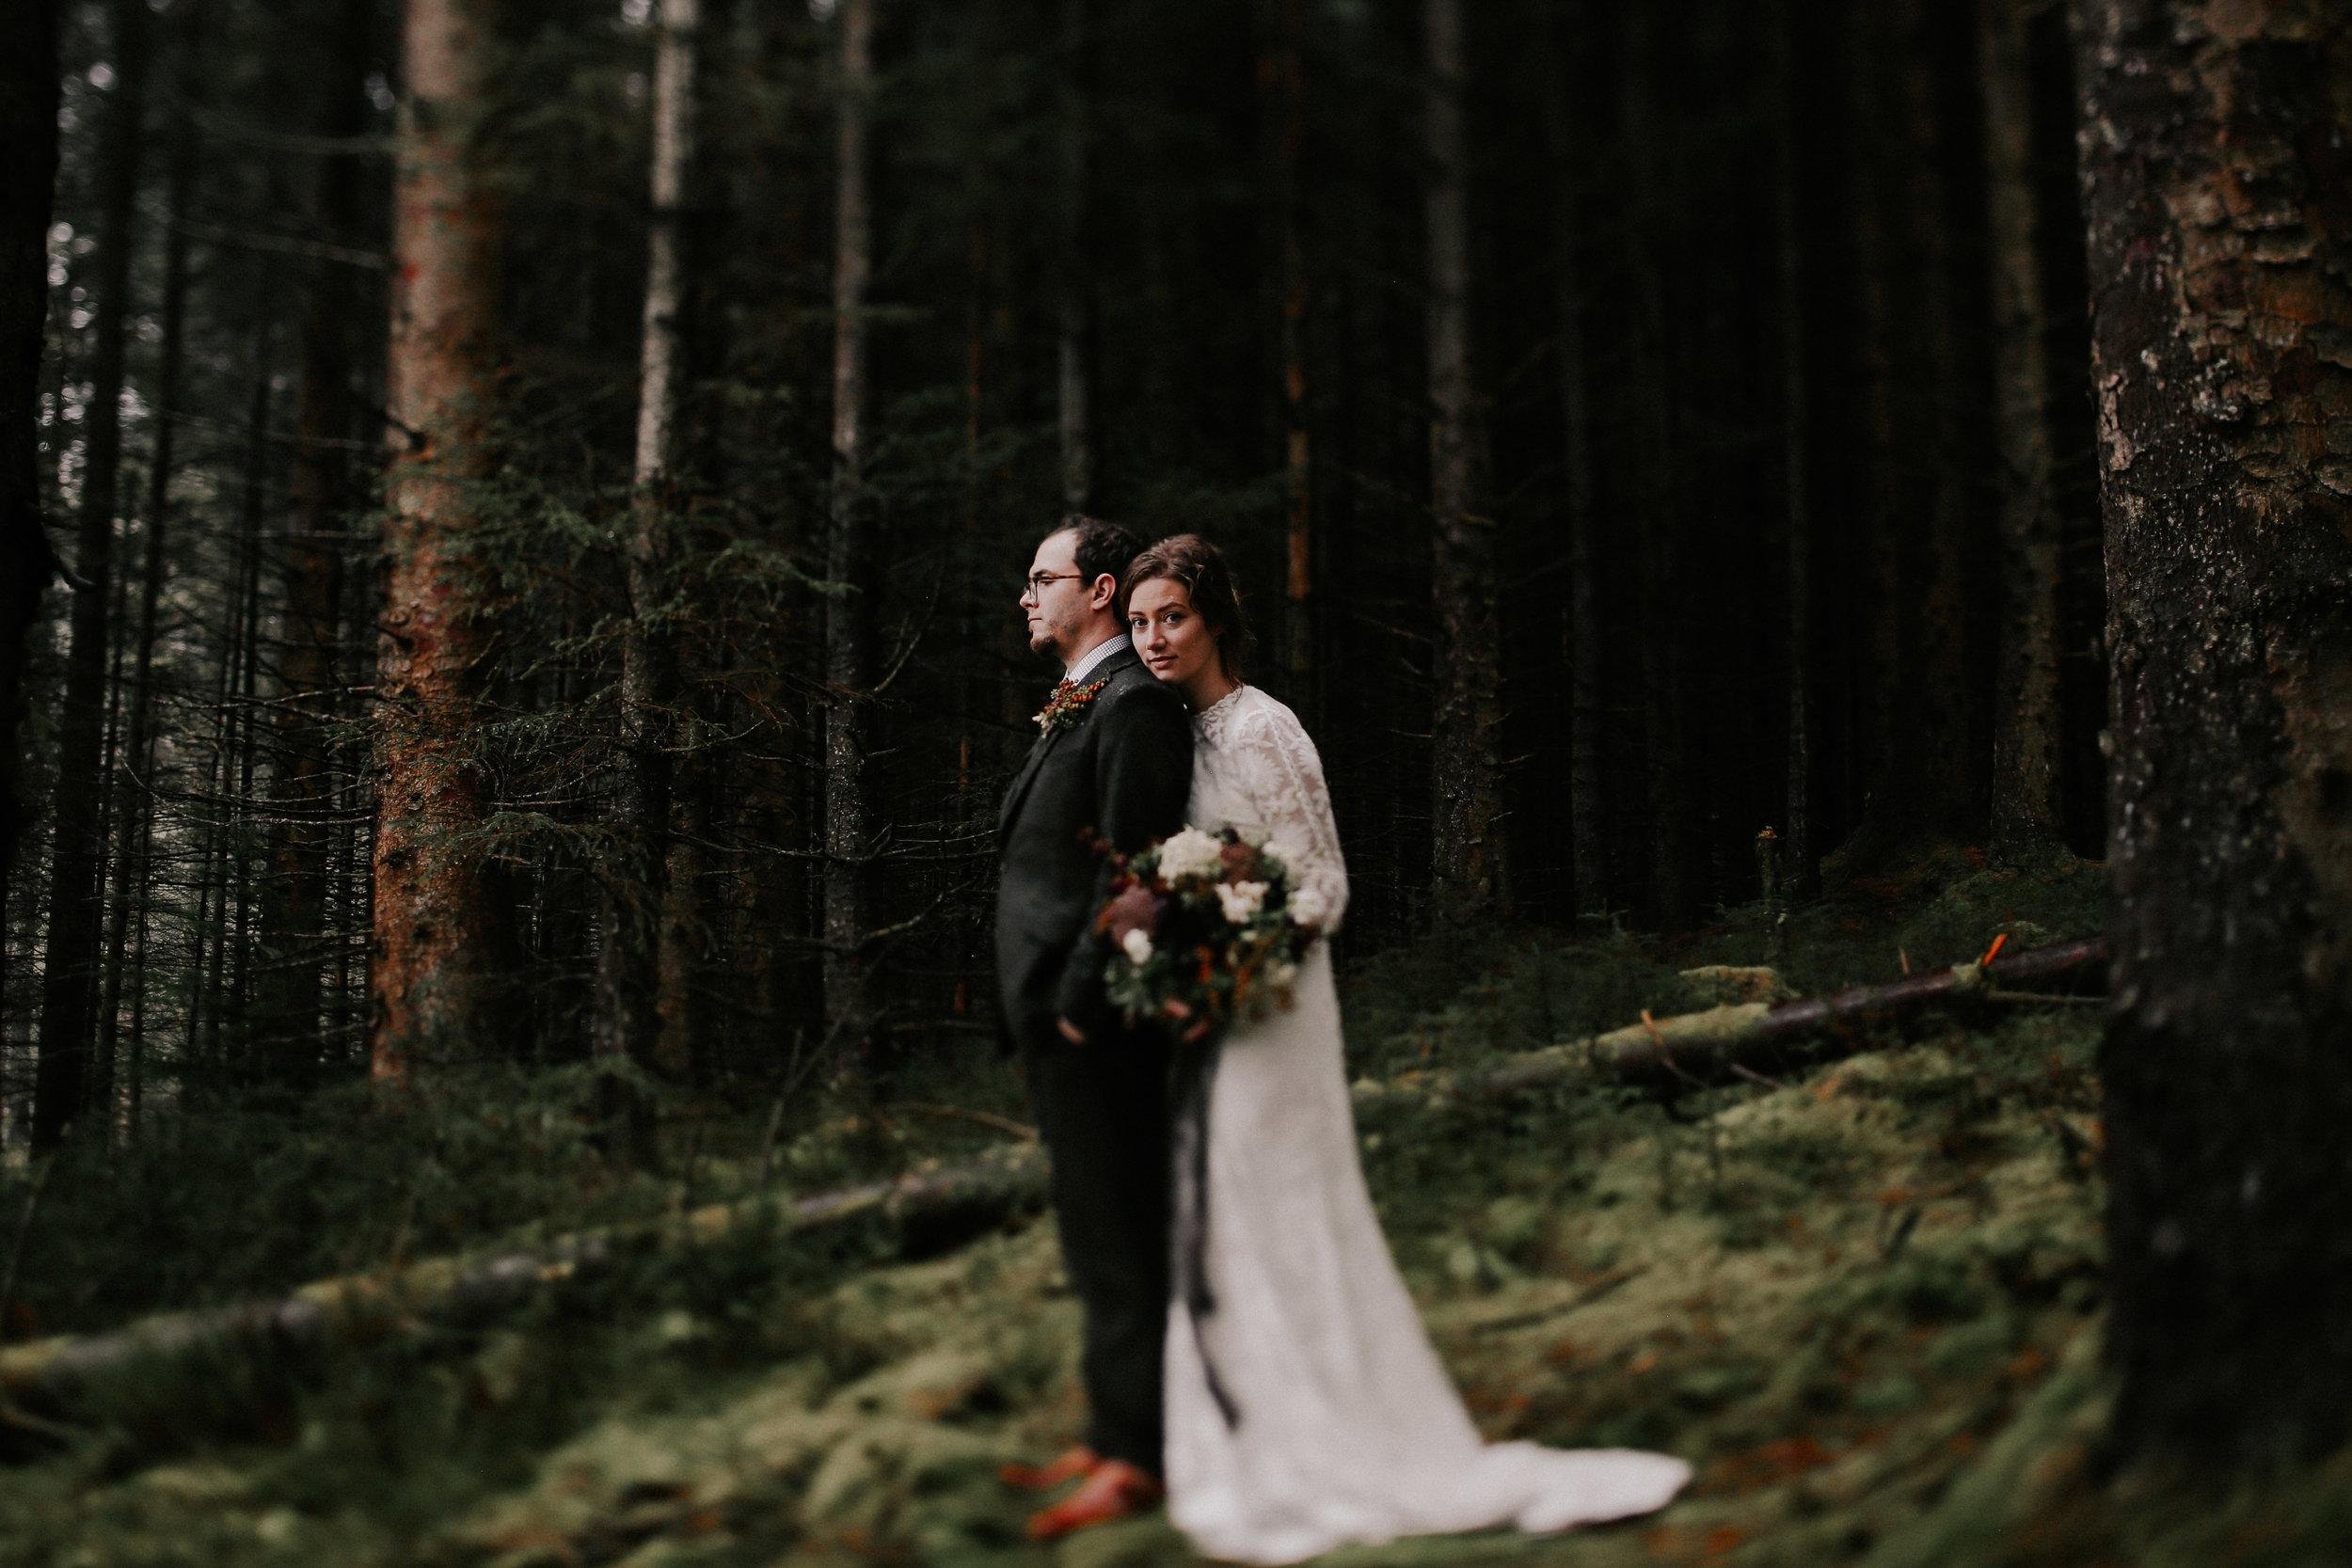 Scotland_Elopement_Melissa_Marshall_Photography_44.jpg